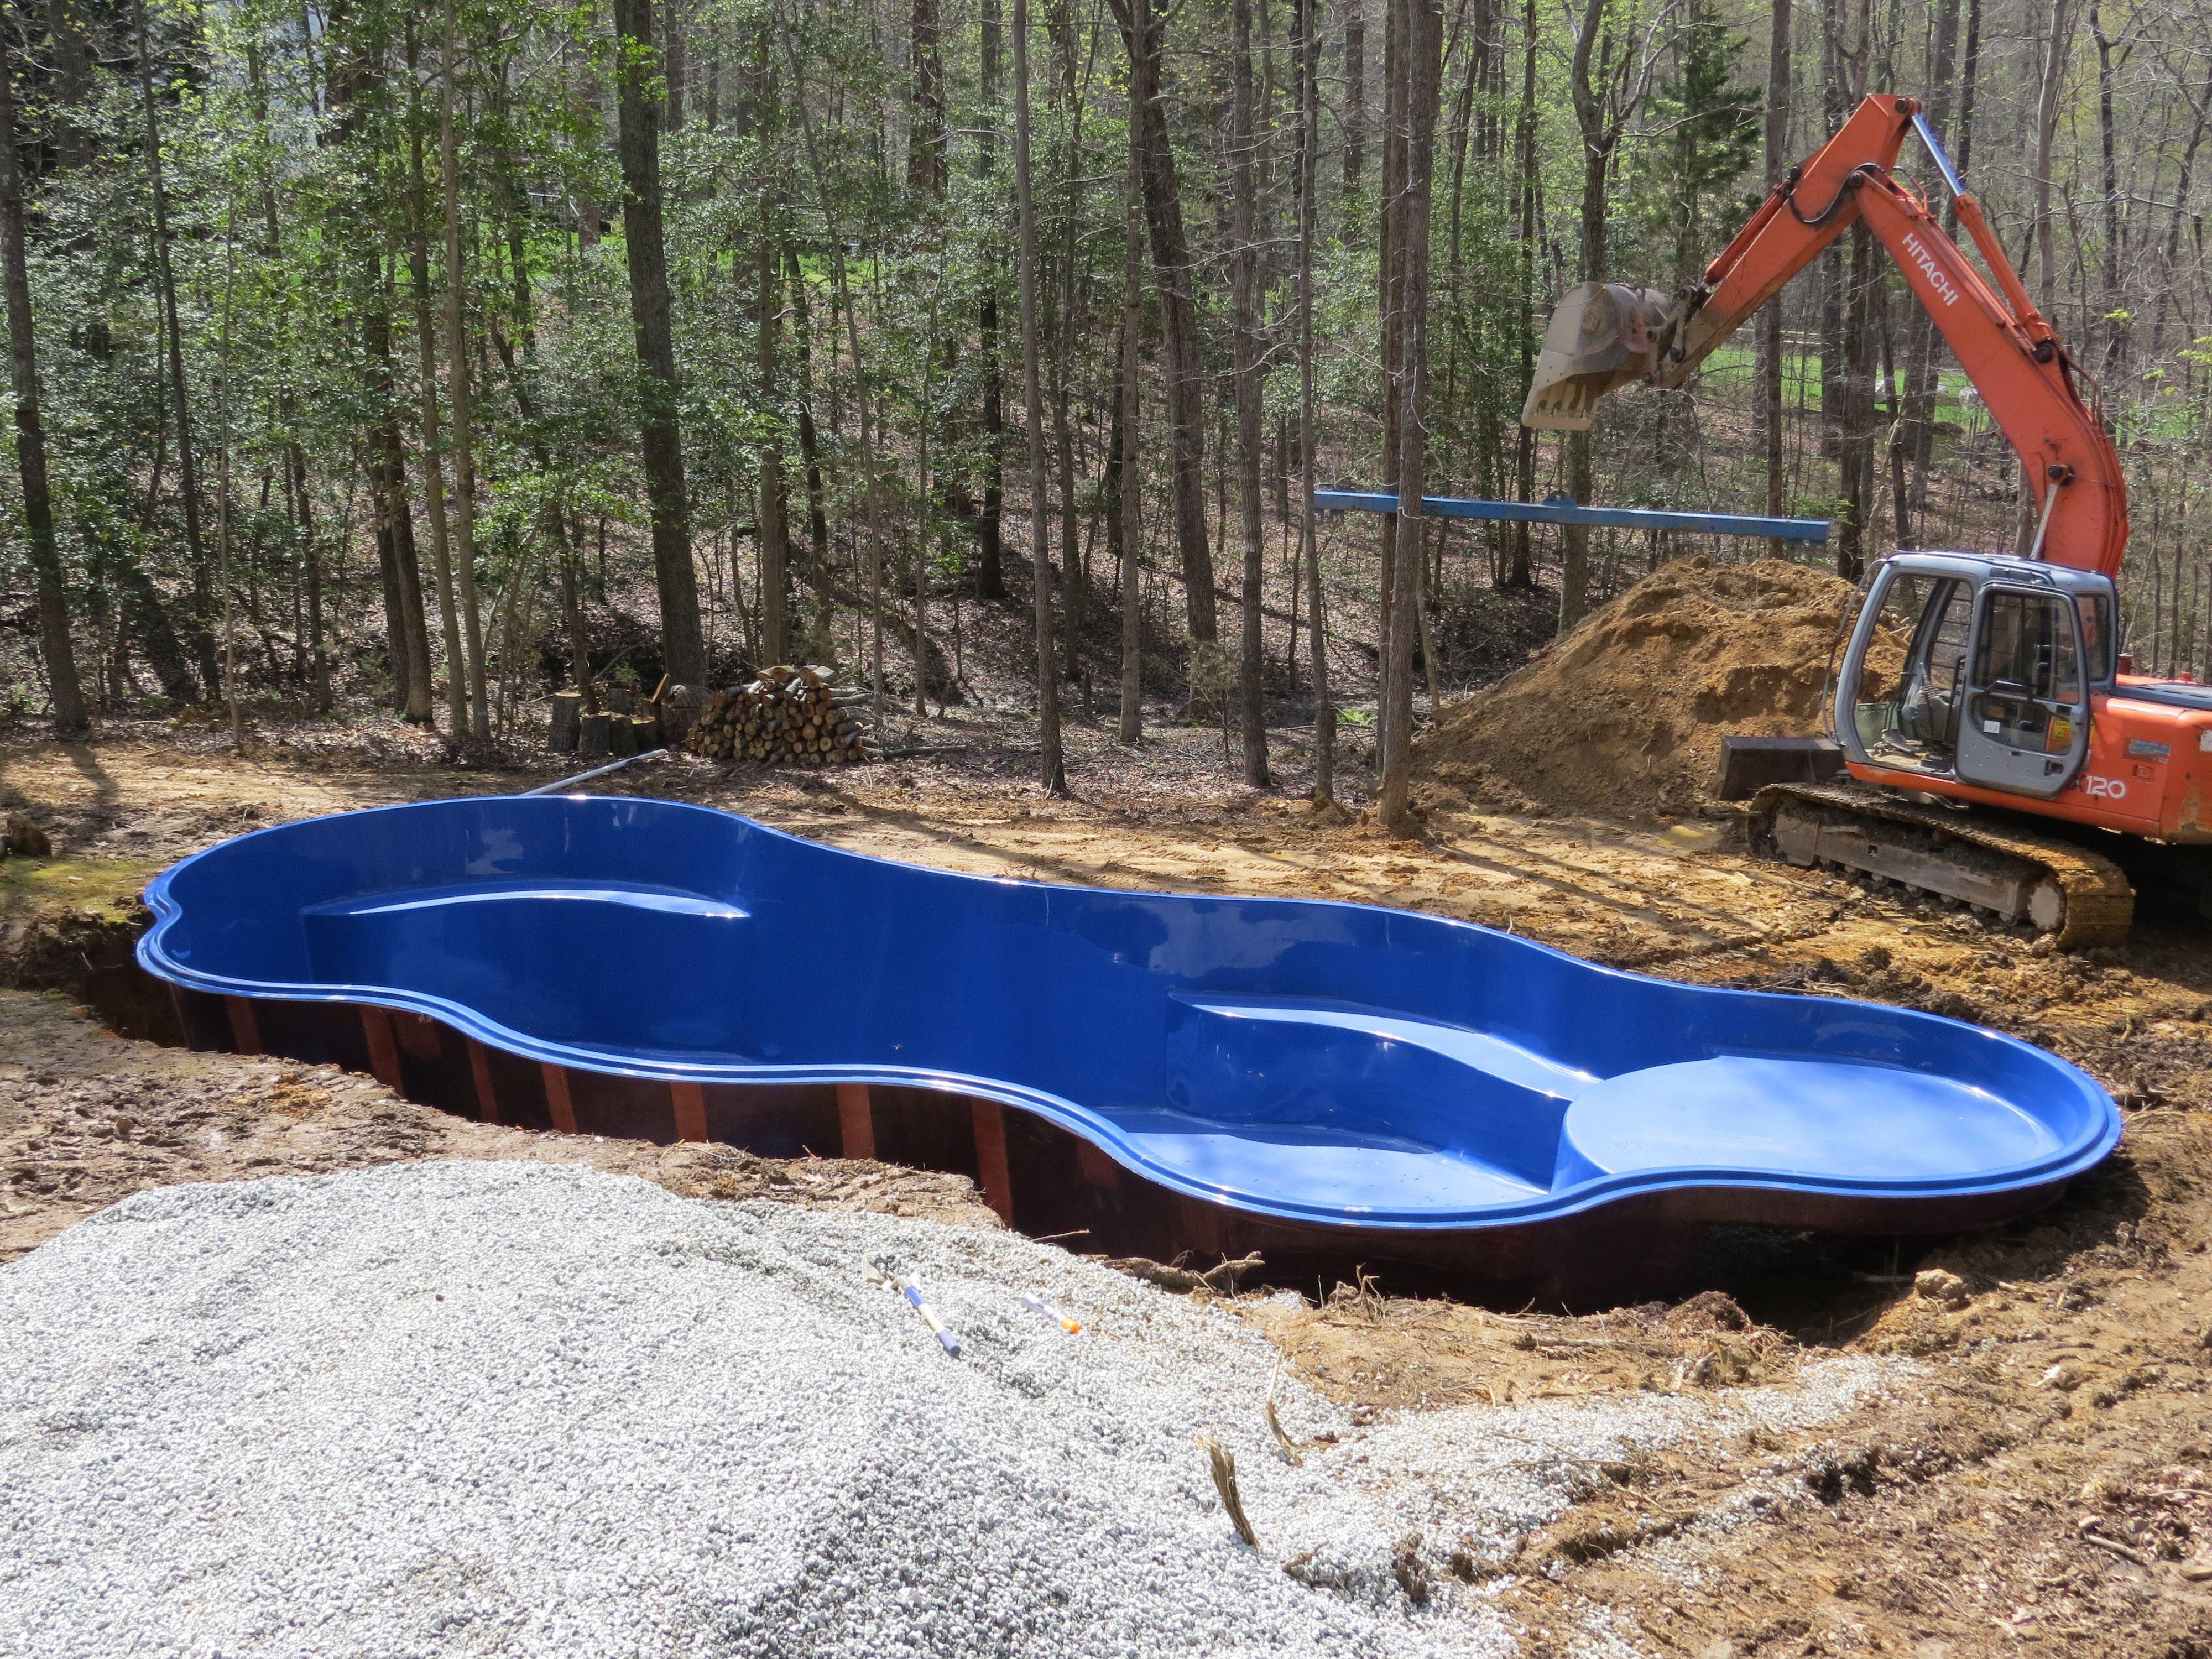 fiberglass pool with tanning ledge  Pool landscaping, Pool shapes